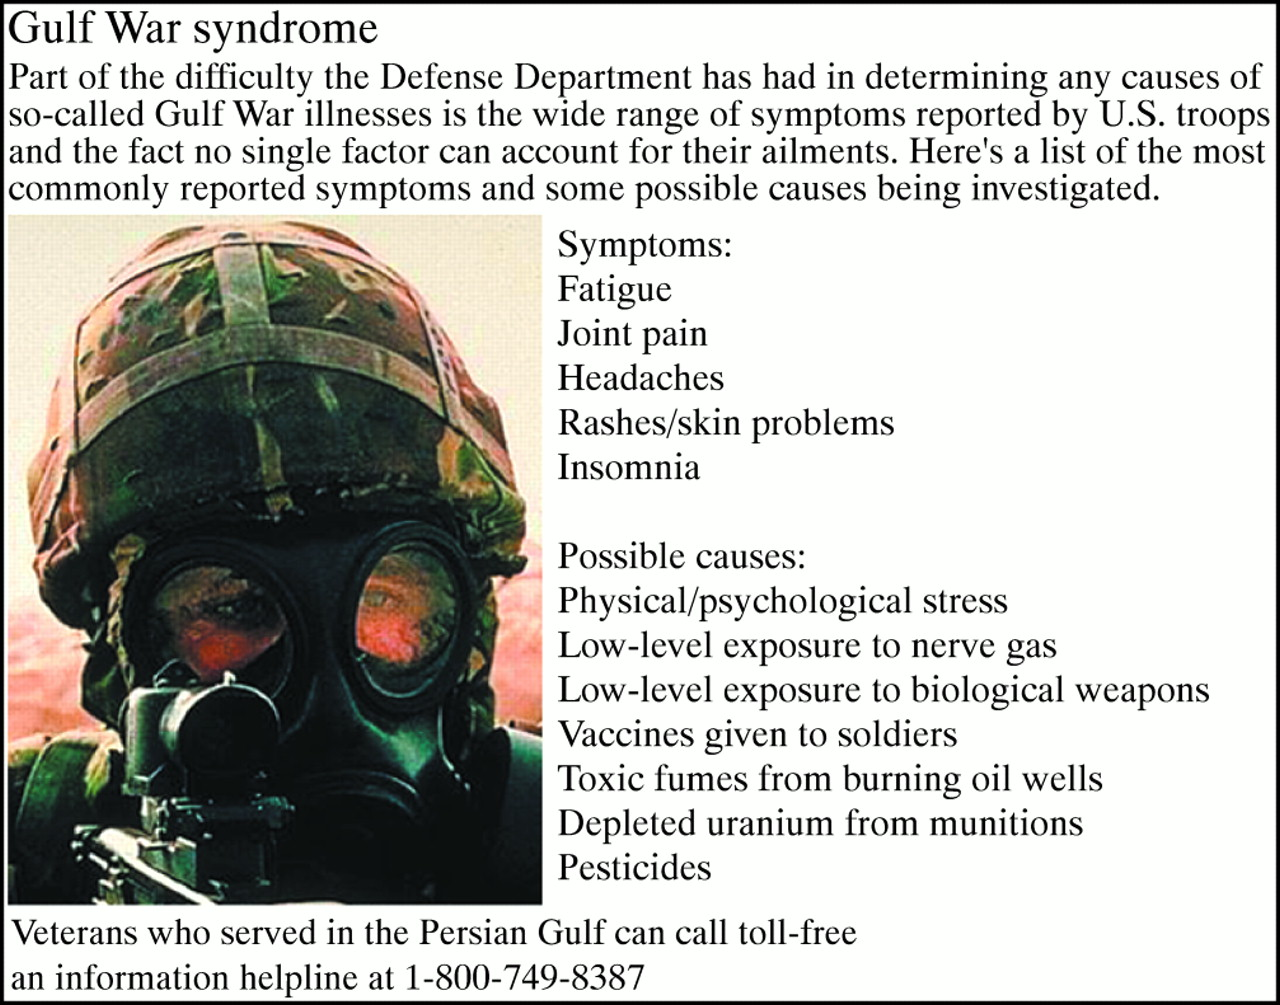 War syndrome